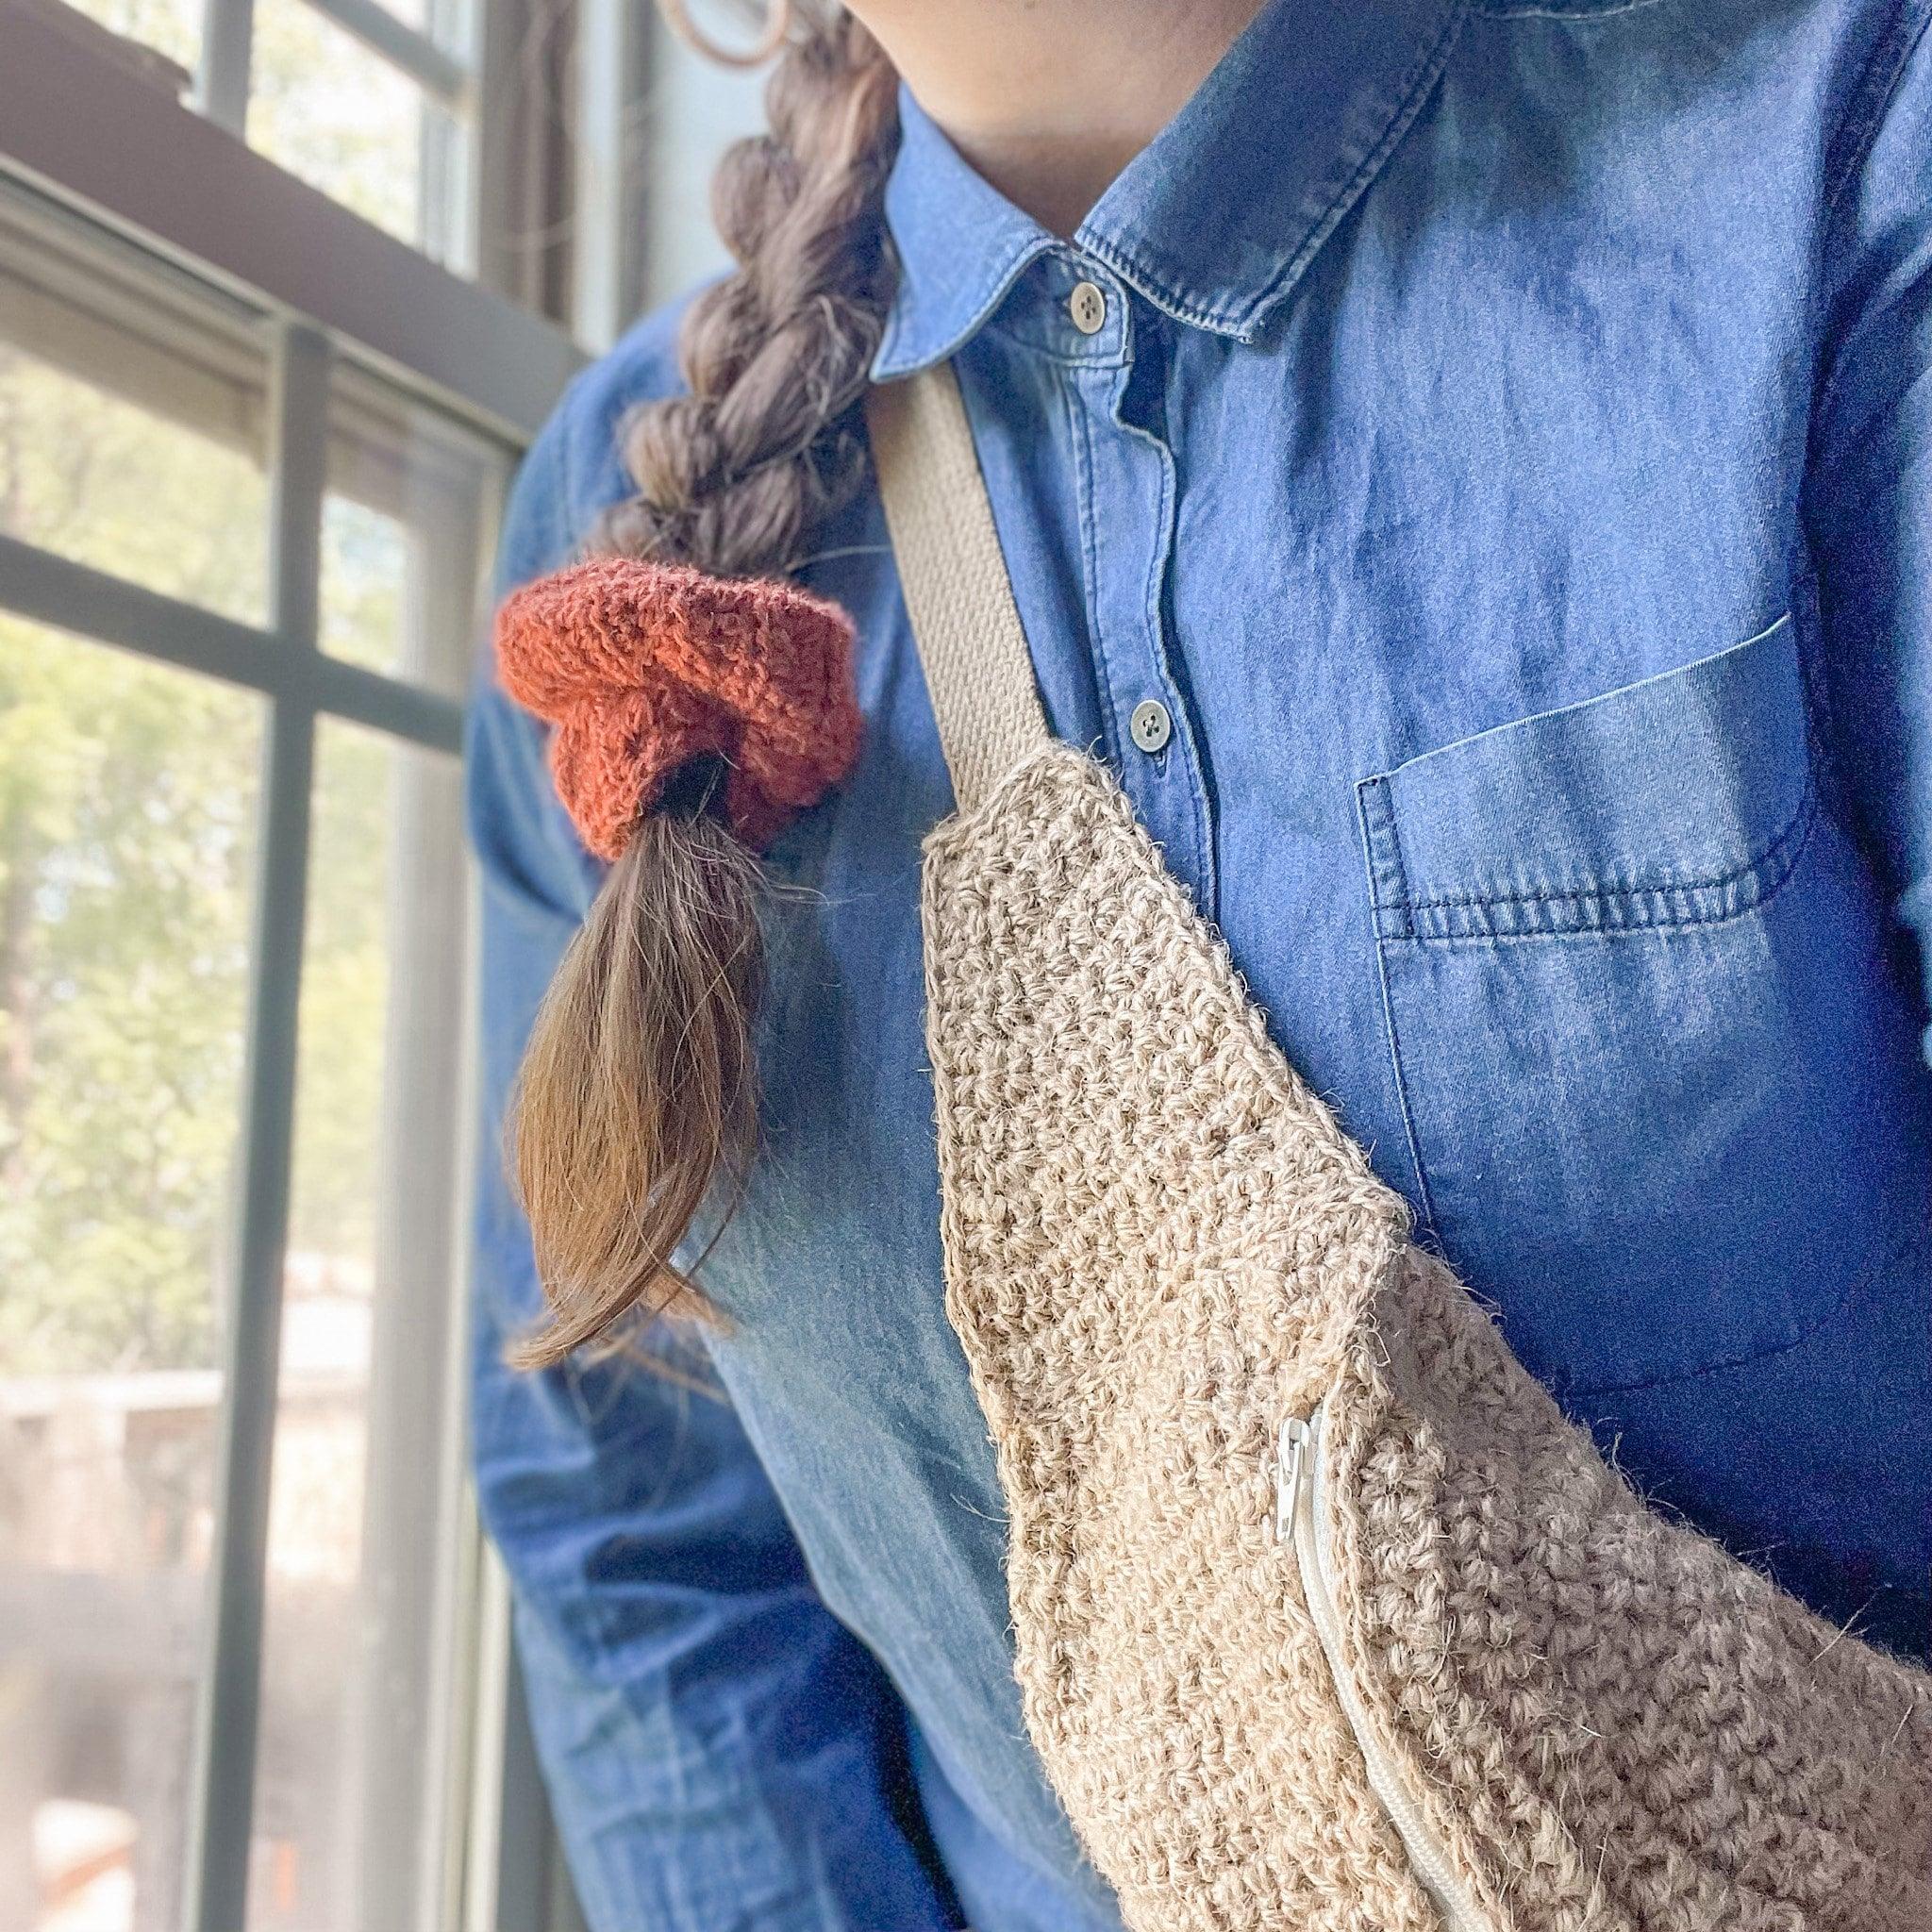 Woman wearing crochet bag and scrunchie